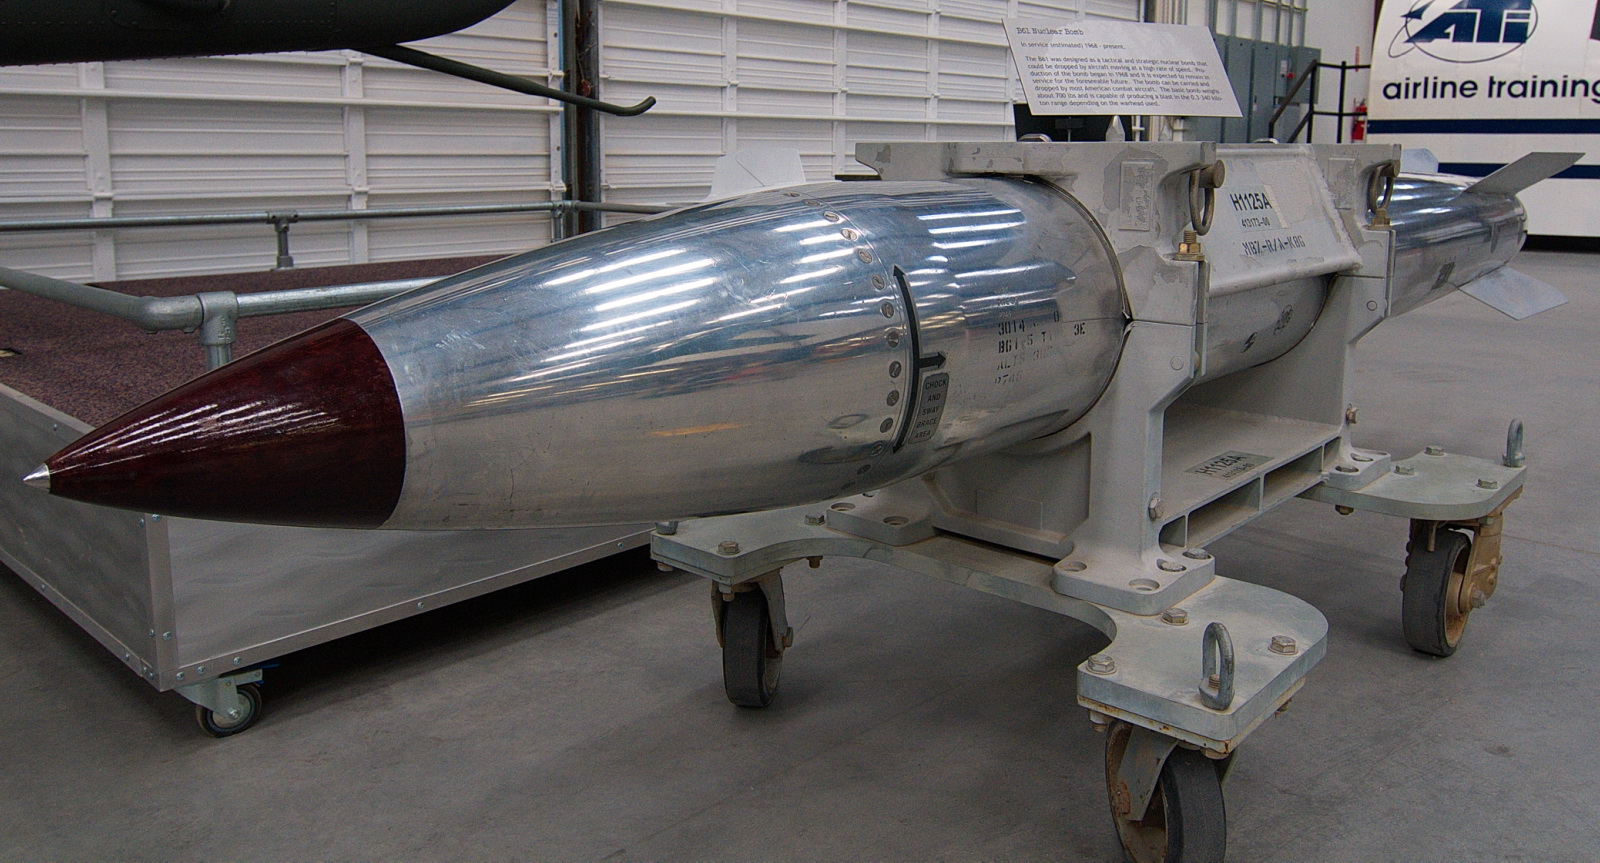 B61 nuclear bomb (training model)